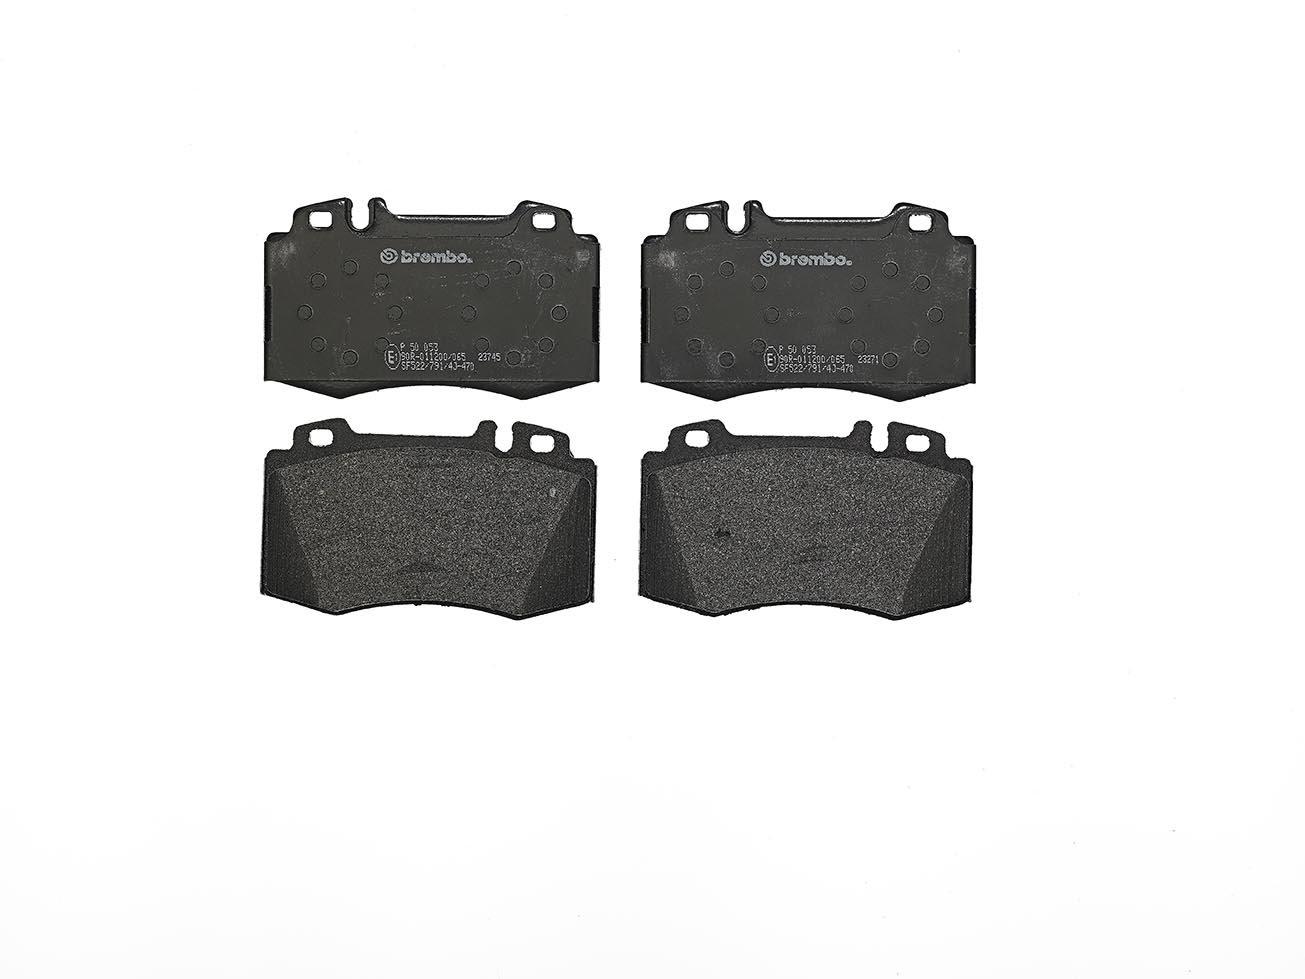 Brembo P50053 Front Disc Brake Pad - Set of 4